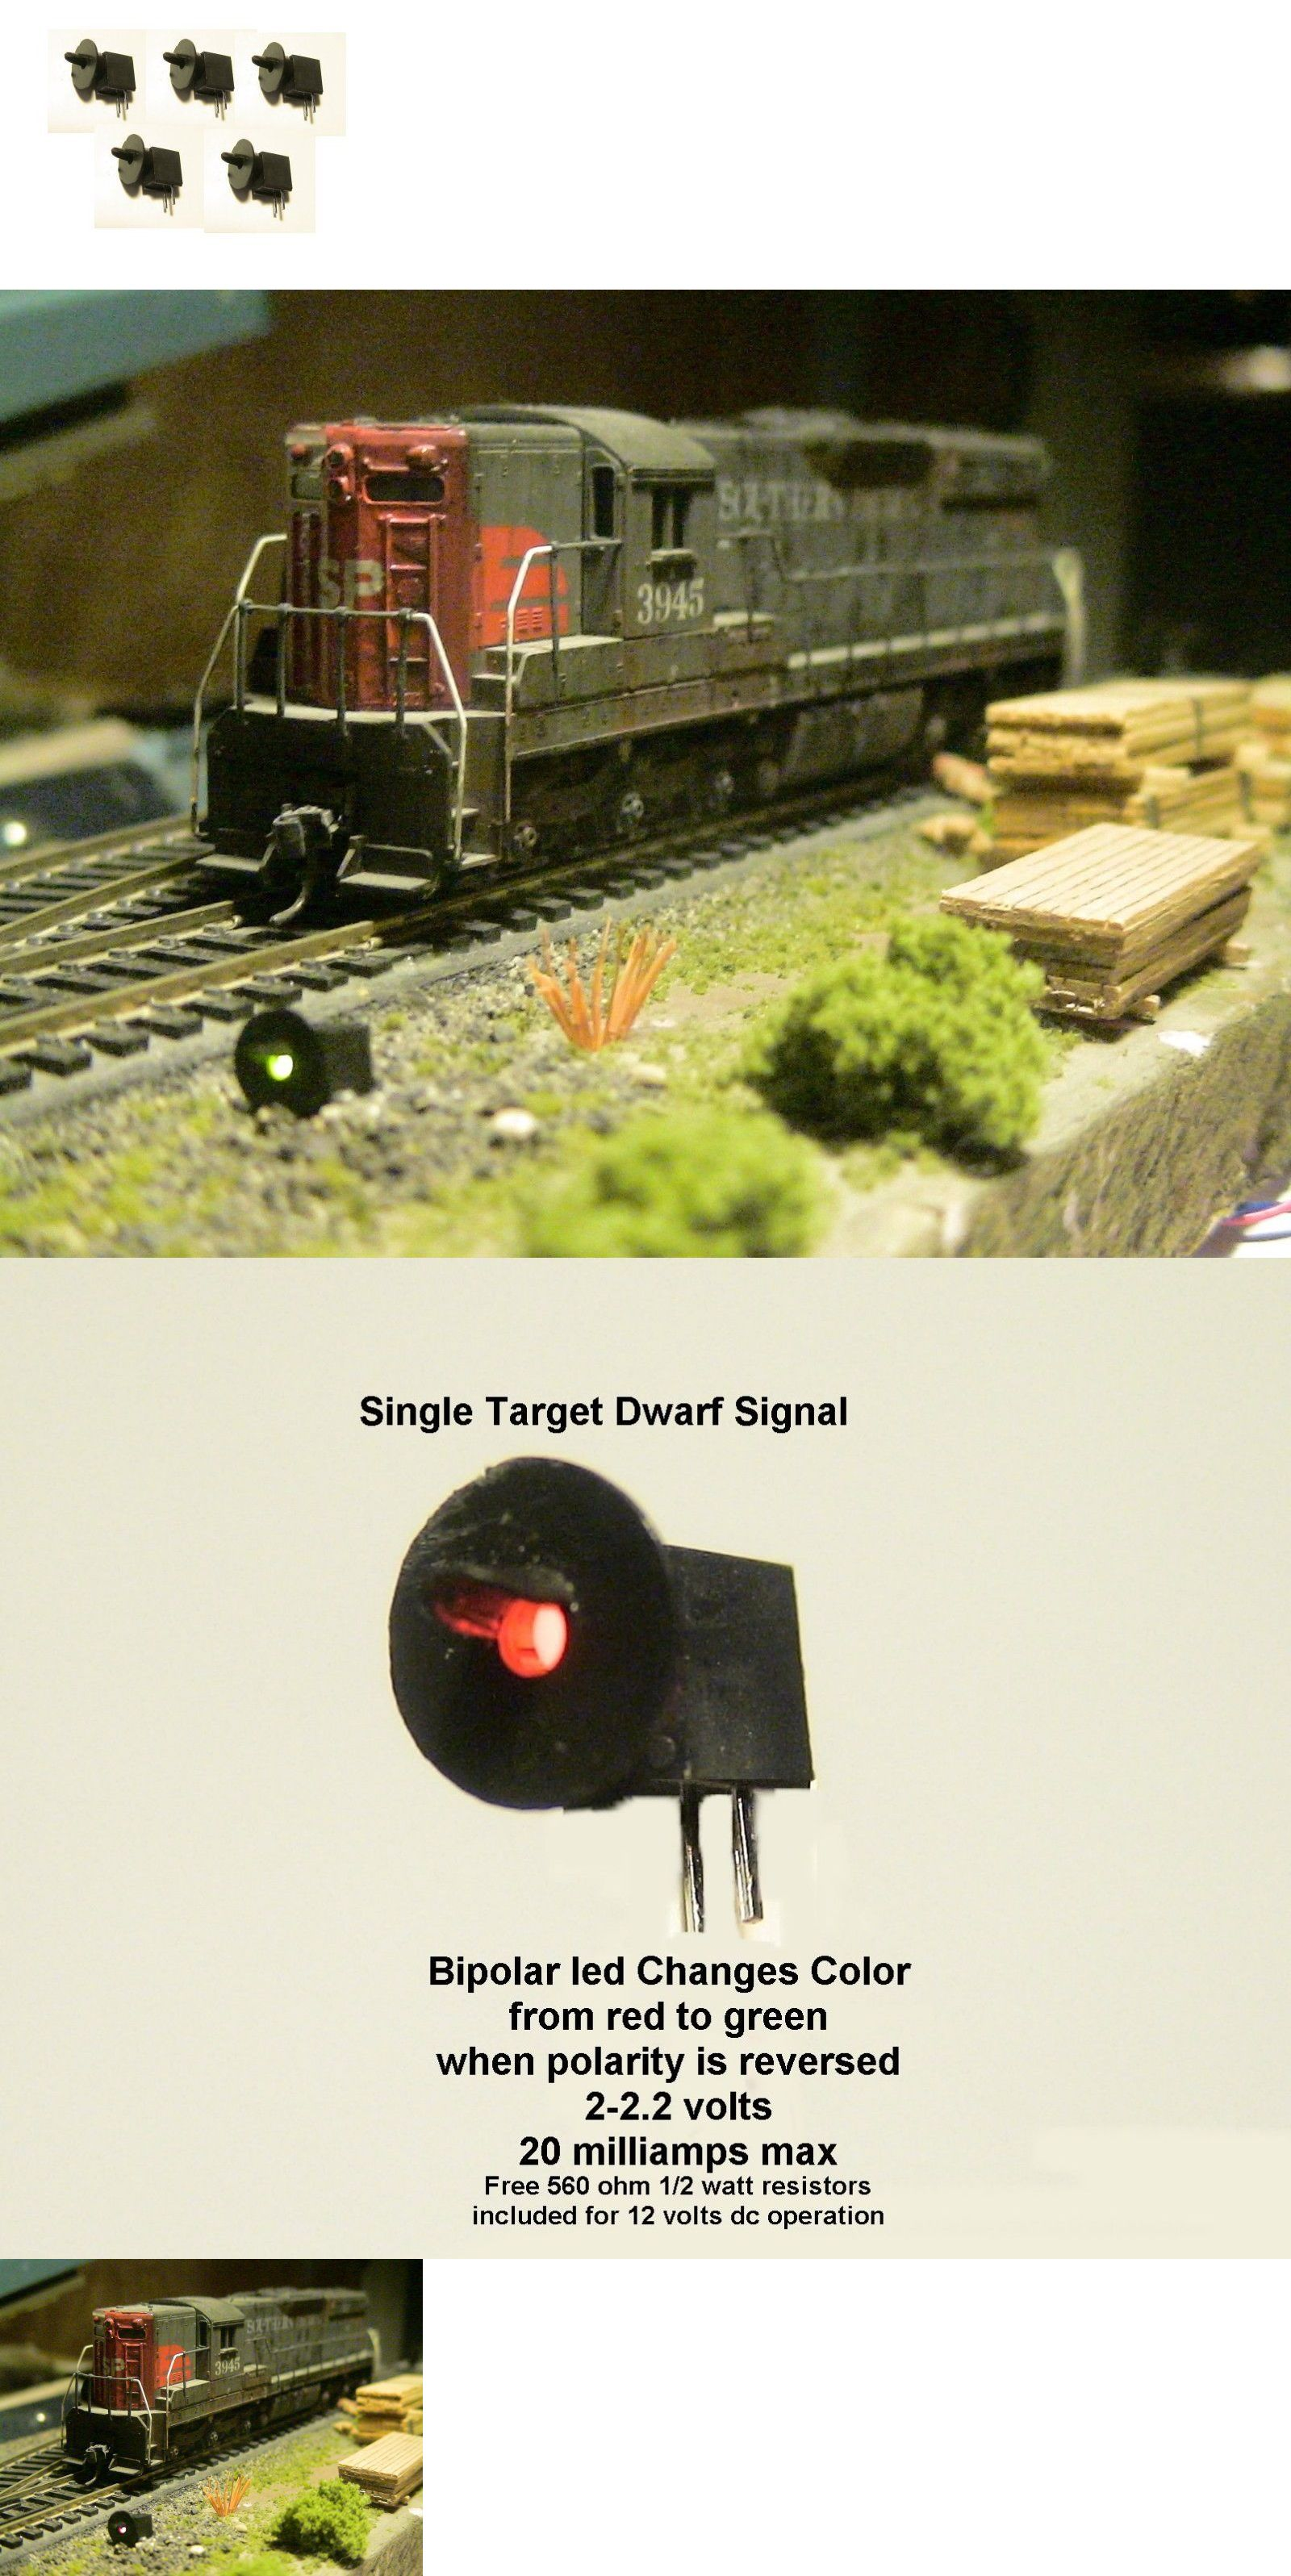 5 SINGLE TARGET HOODED  BIPOLAR HO SCALE 3MM DWARF LED SIGNALS